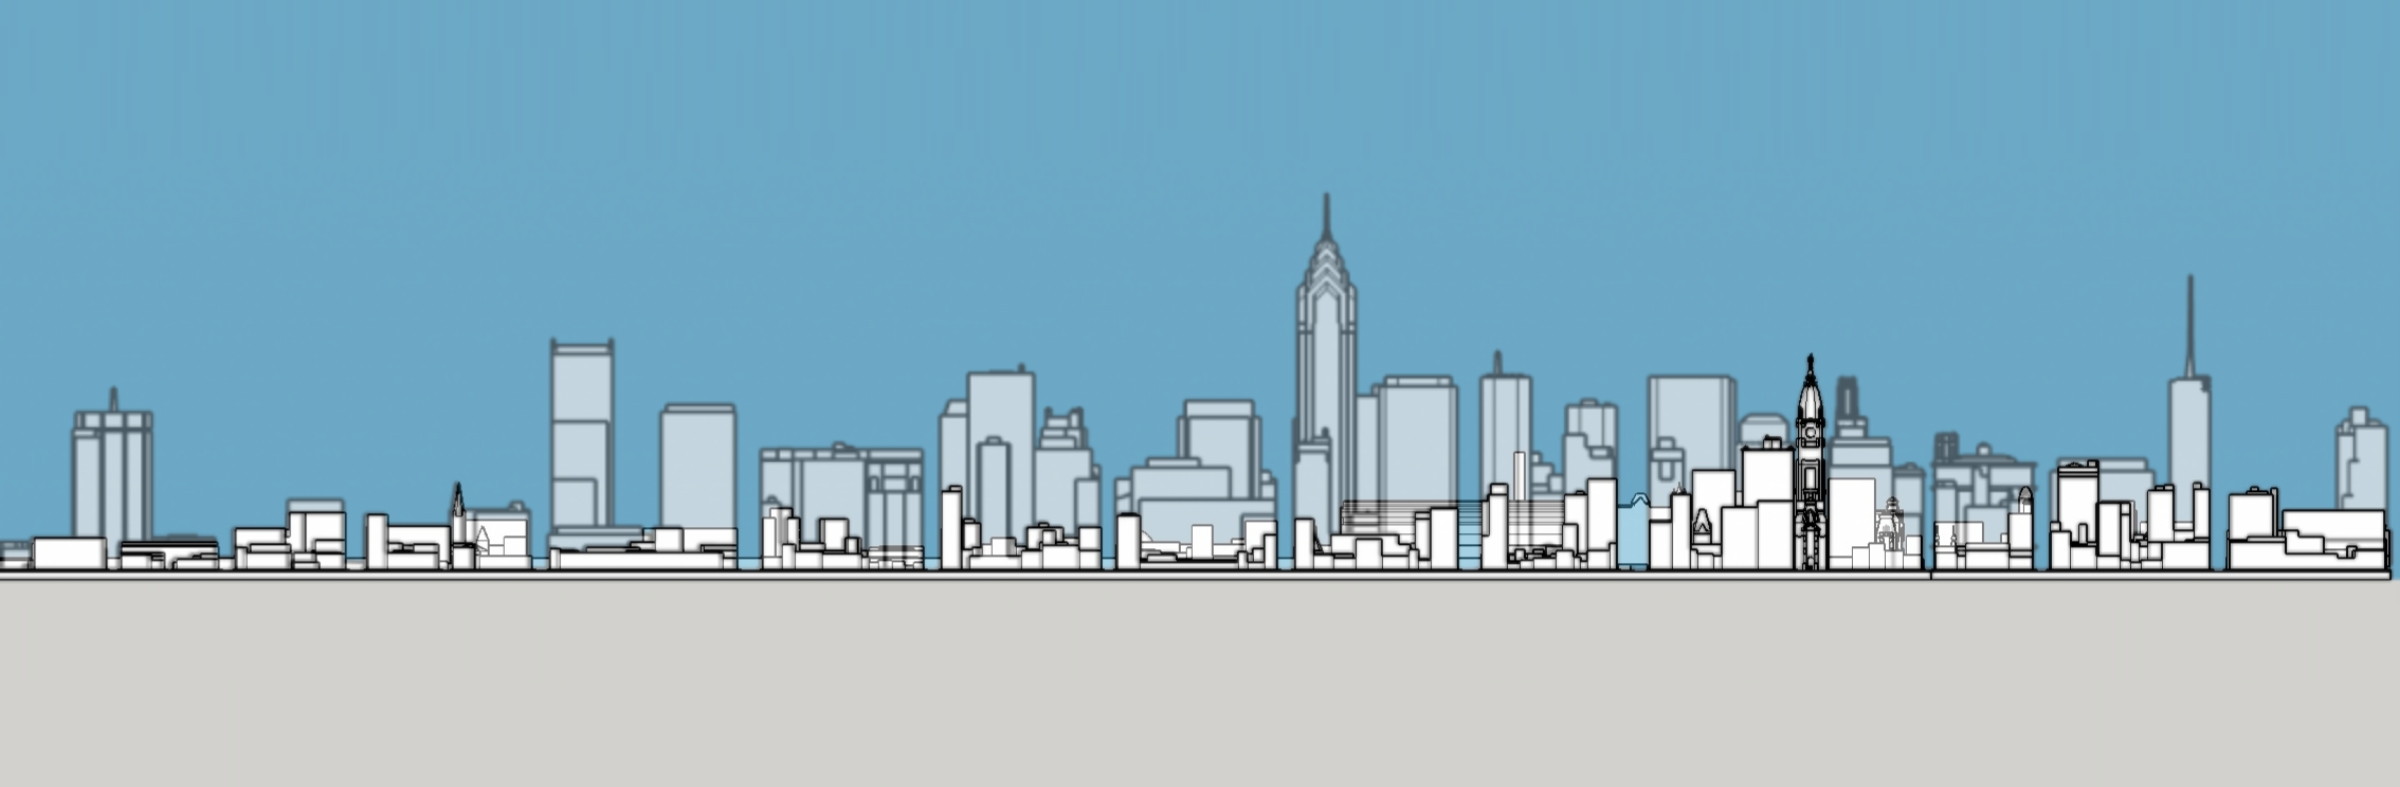 Philadelphia skyline 1905 and 1987 south elevation. Photo by Thomas Koloski